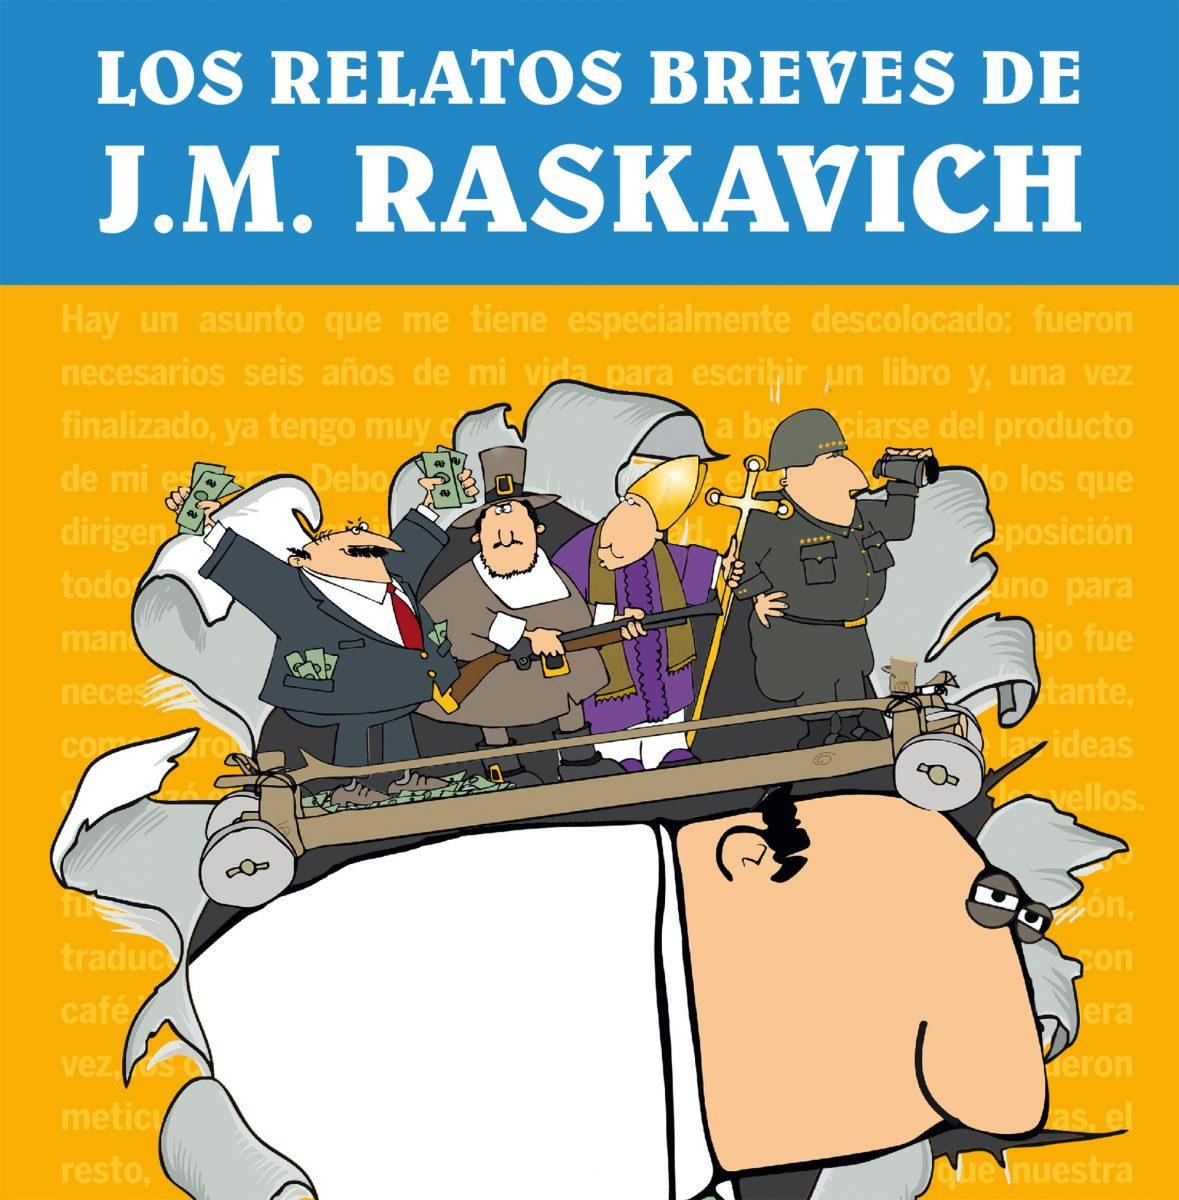 El próximo Best Seller - Los-Relatos-Breves de JM Raskavich